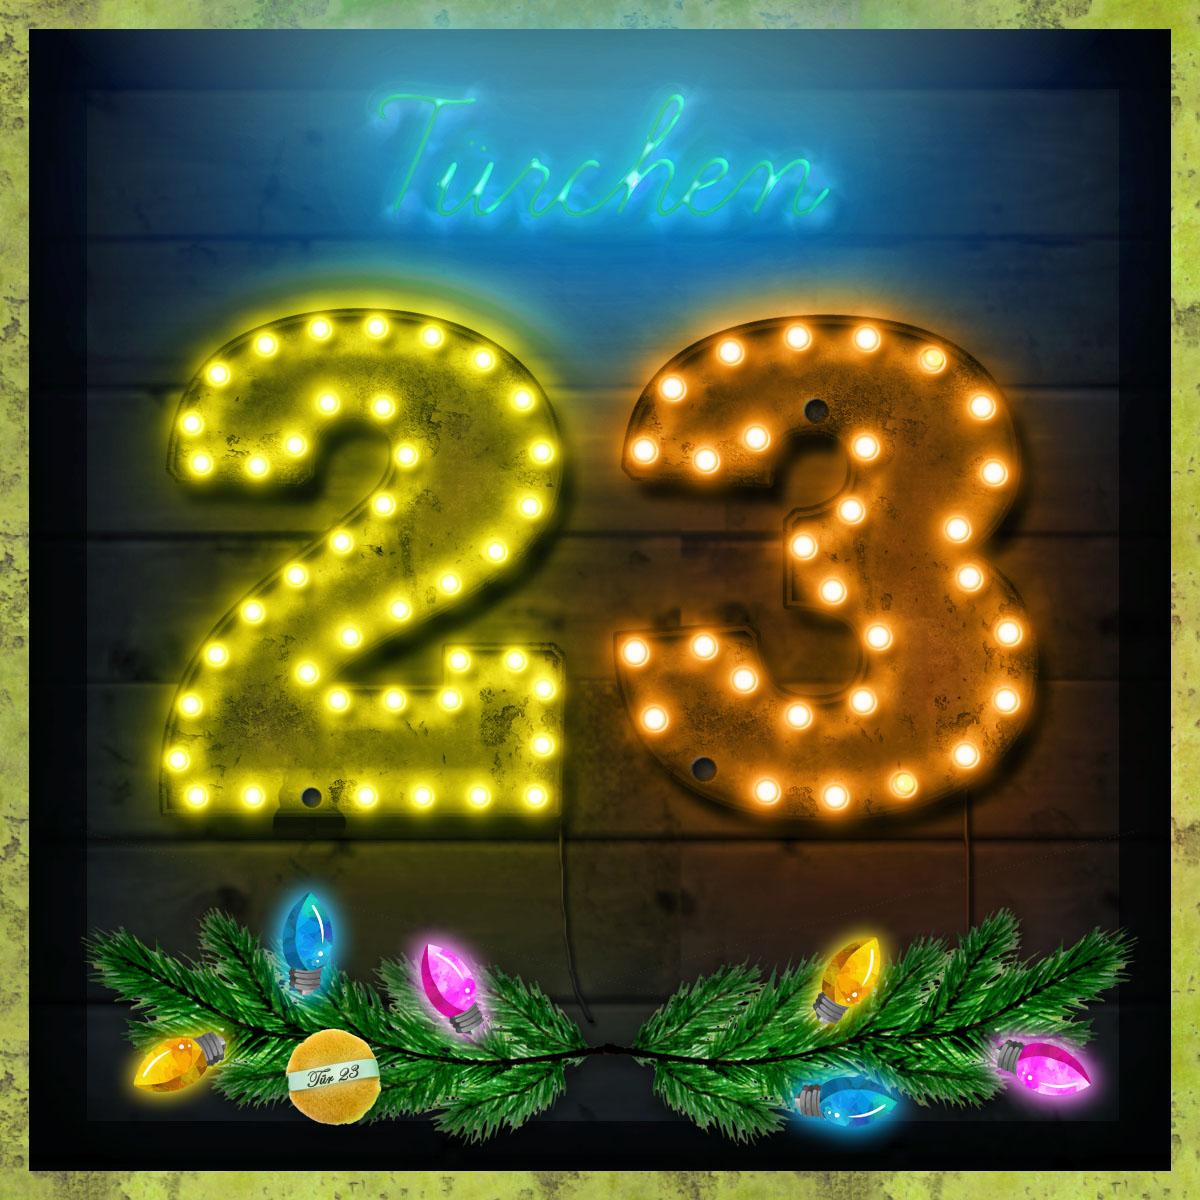 Tür 23 des MAGIMANIA Adventskalenders 2017